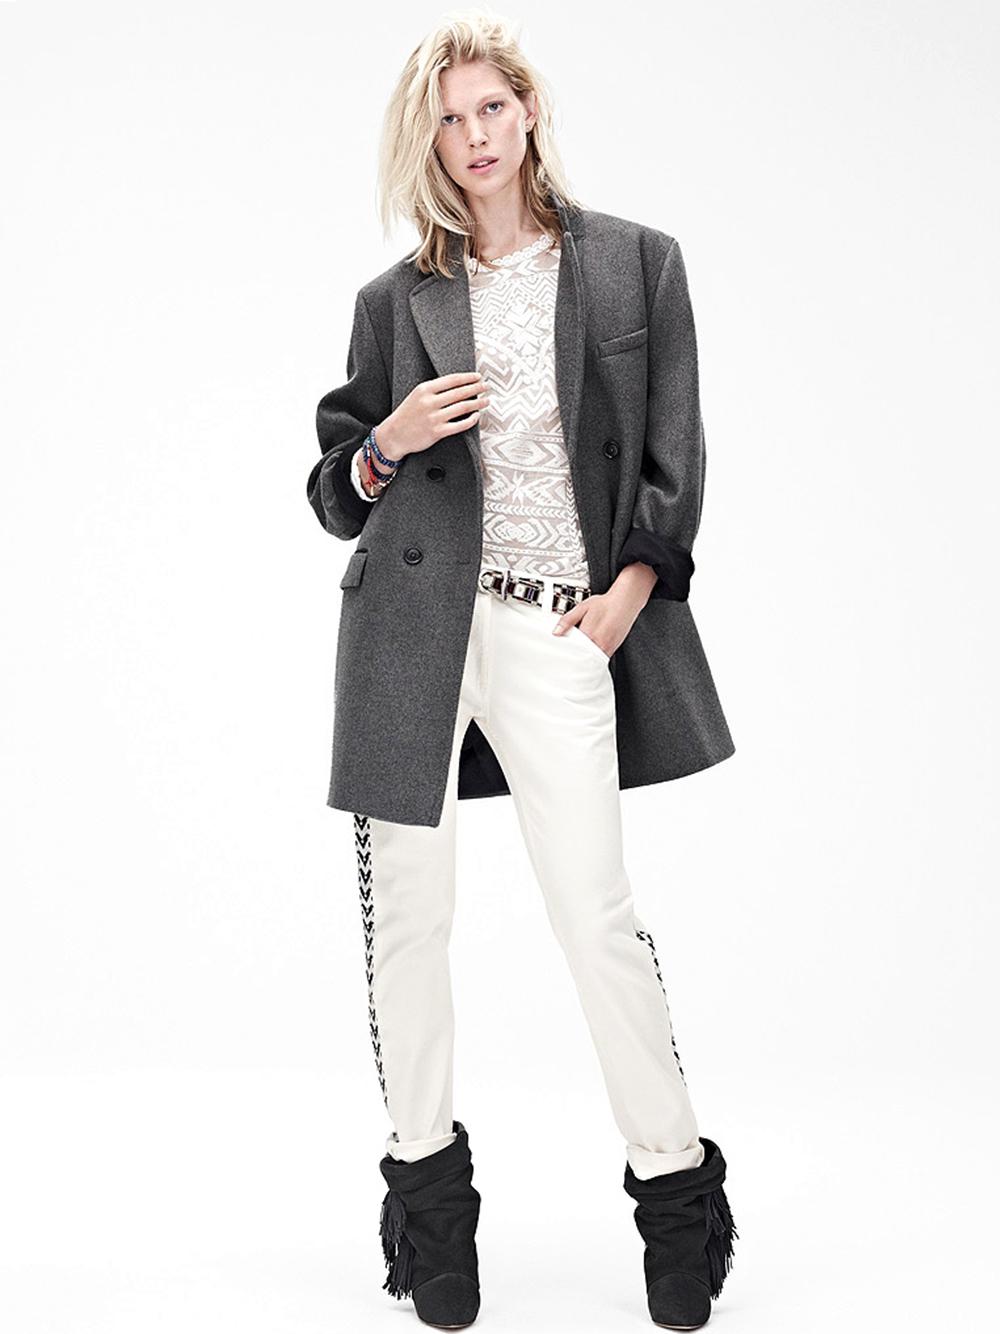 Isabel Marant x H&M — 2013